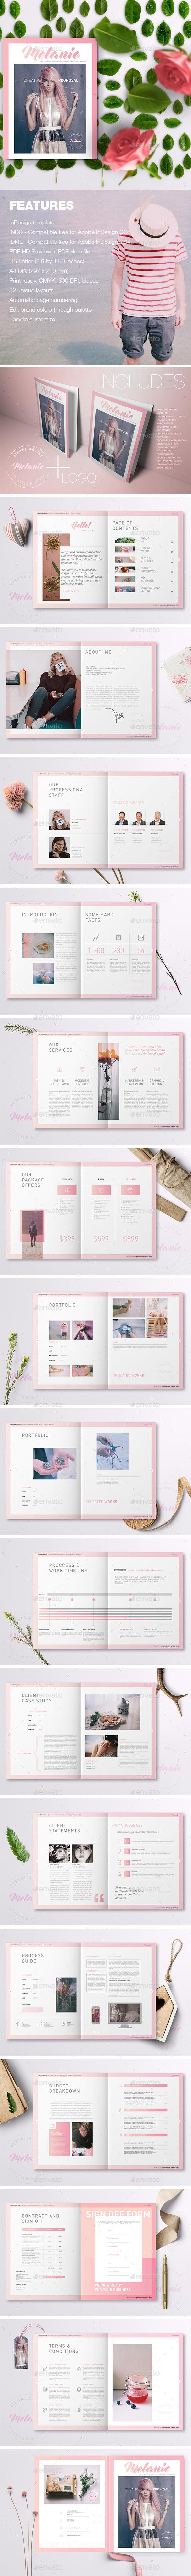 Melanie - Creative Proposal - Brochures Print Templates